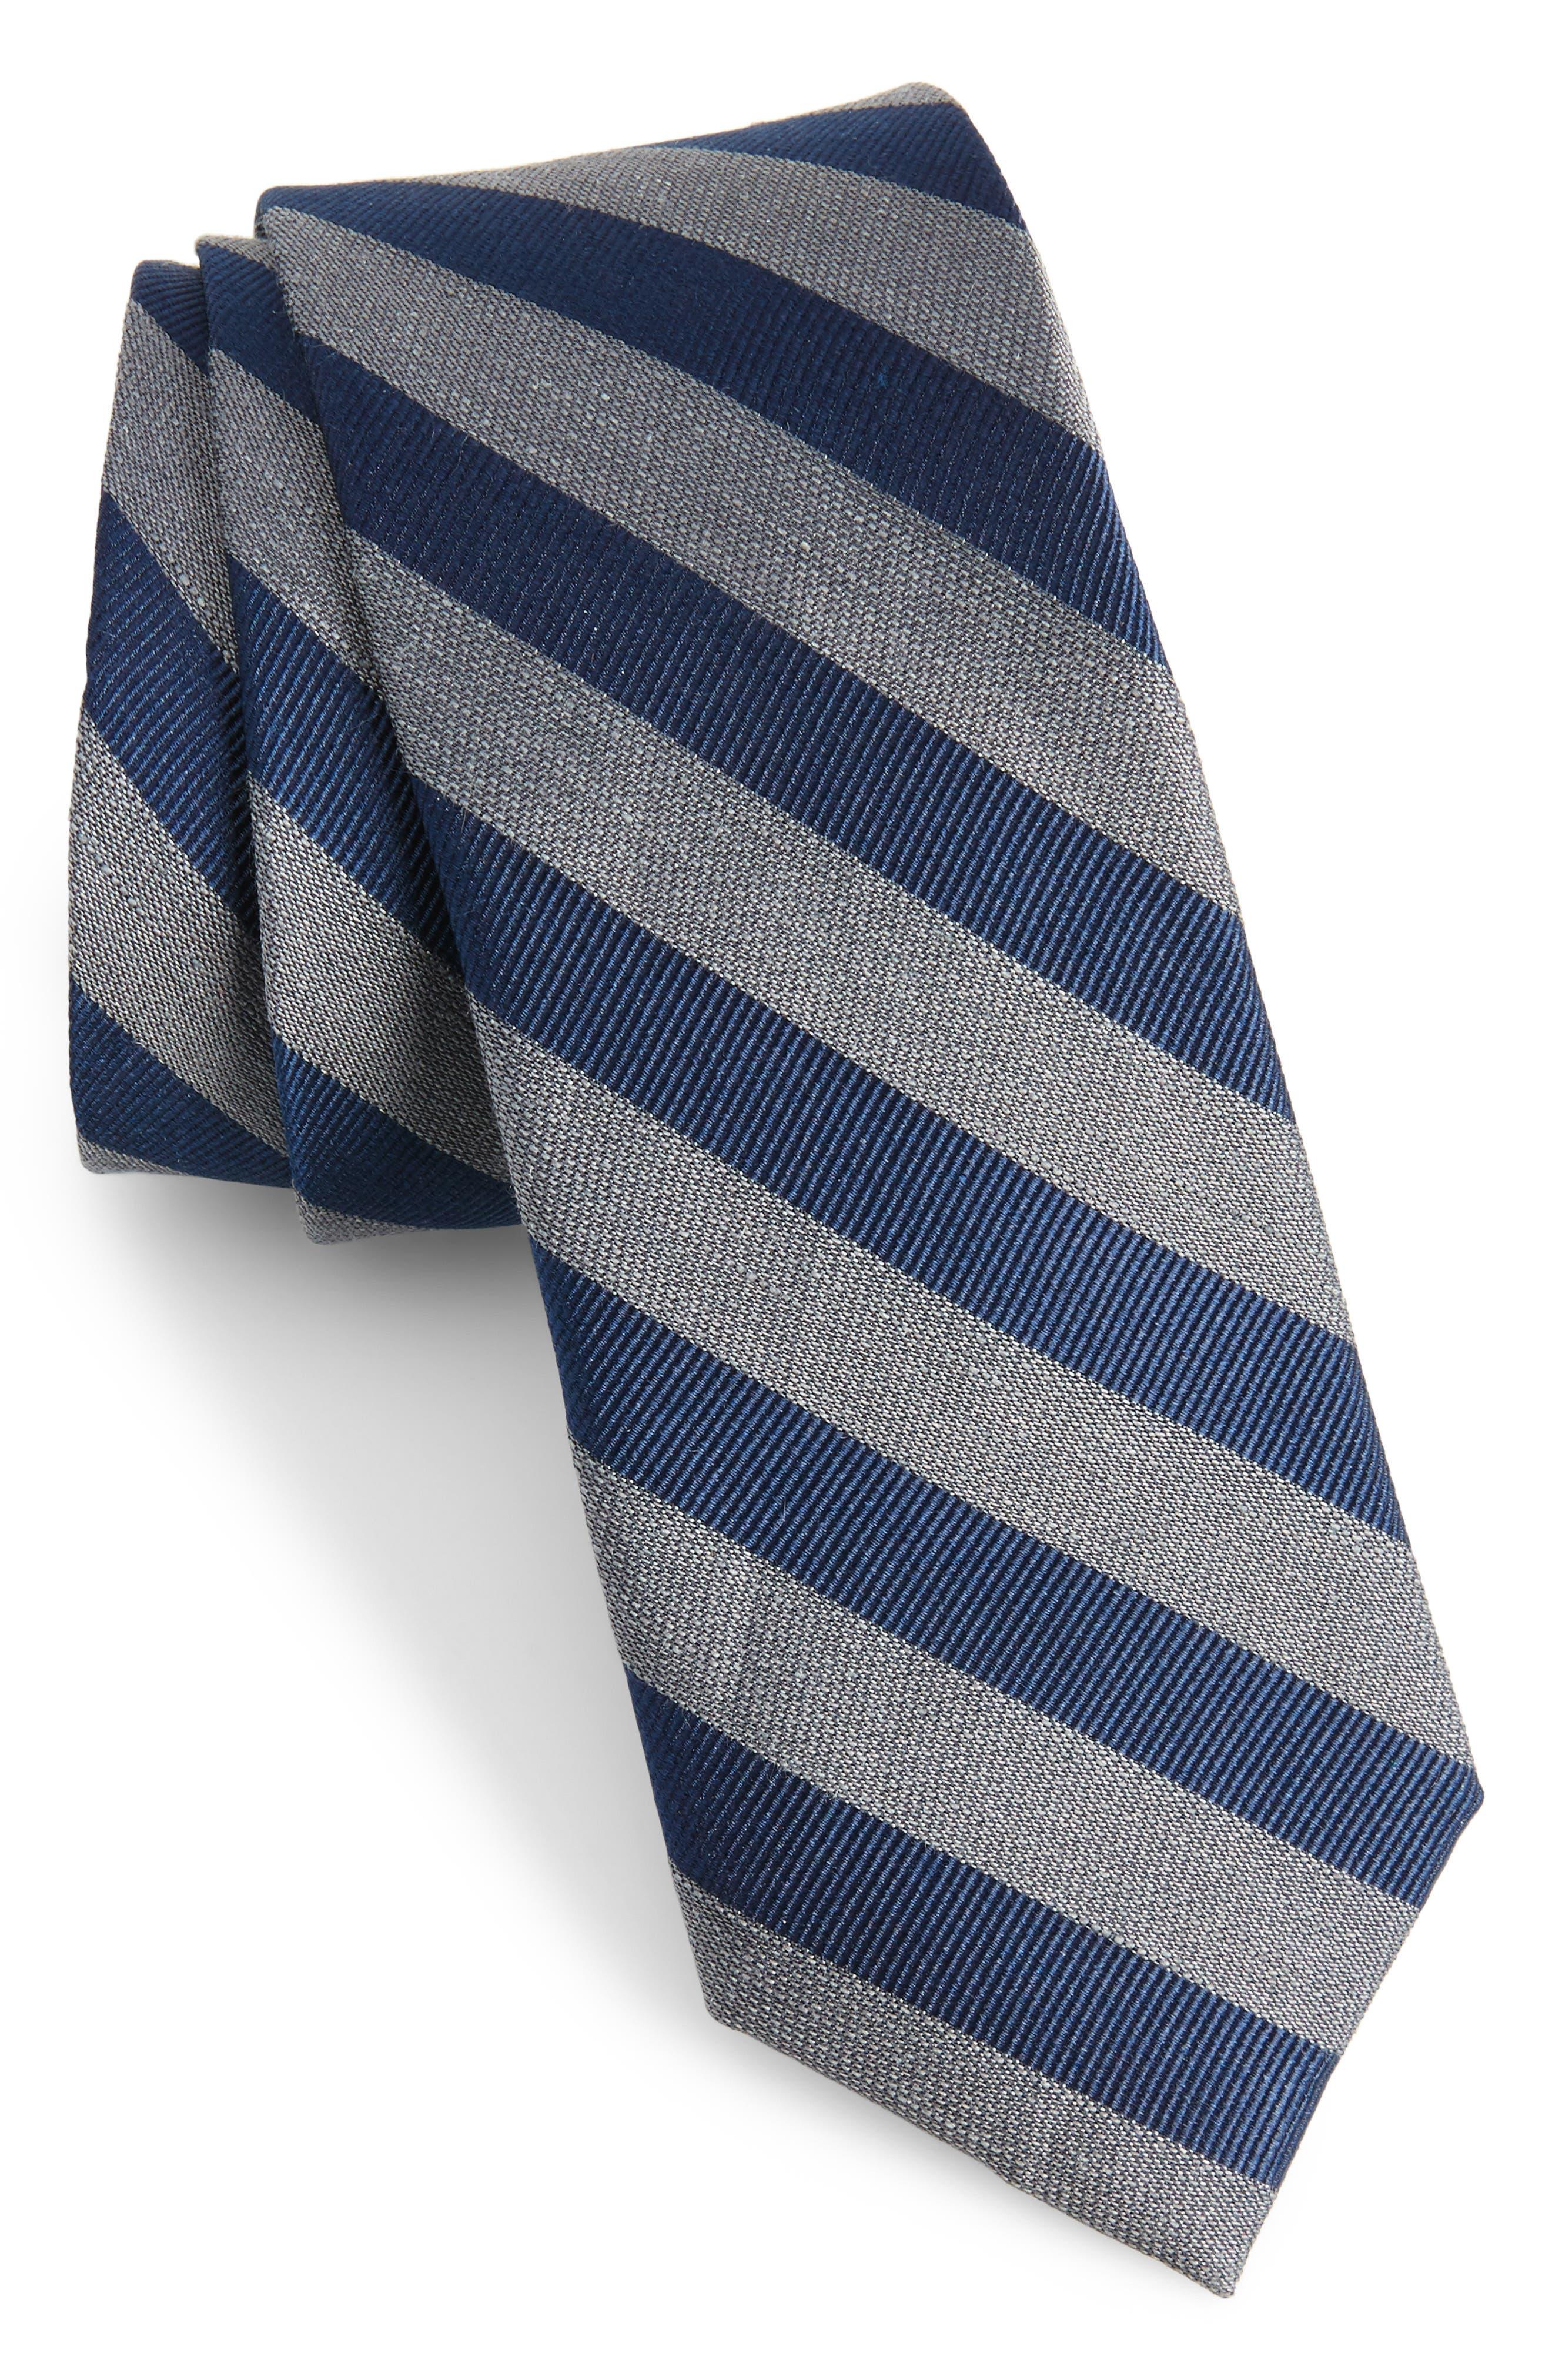 Lumber Stripe Silk & Linen Tie,                             Main thumbnail 1, color,                             030